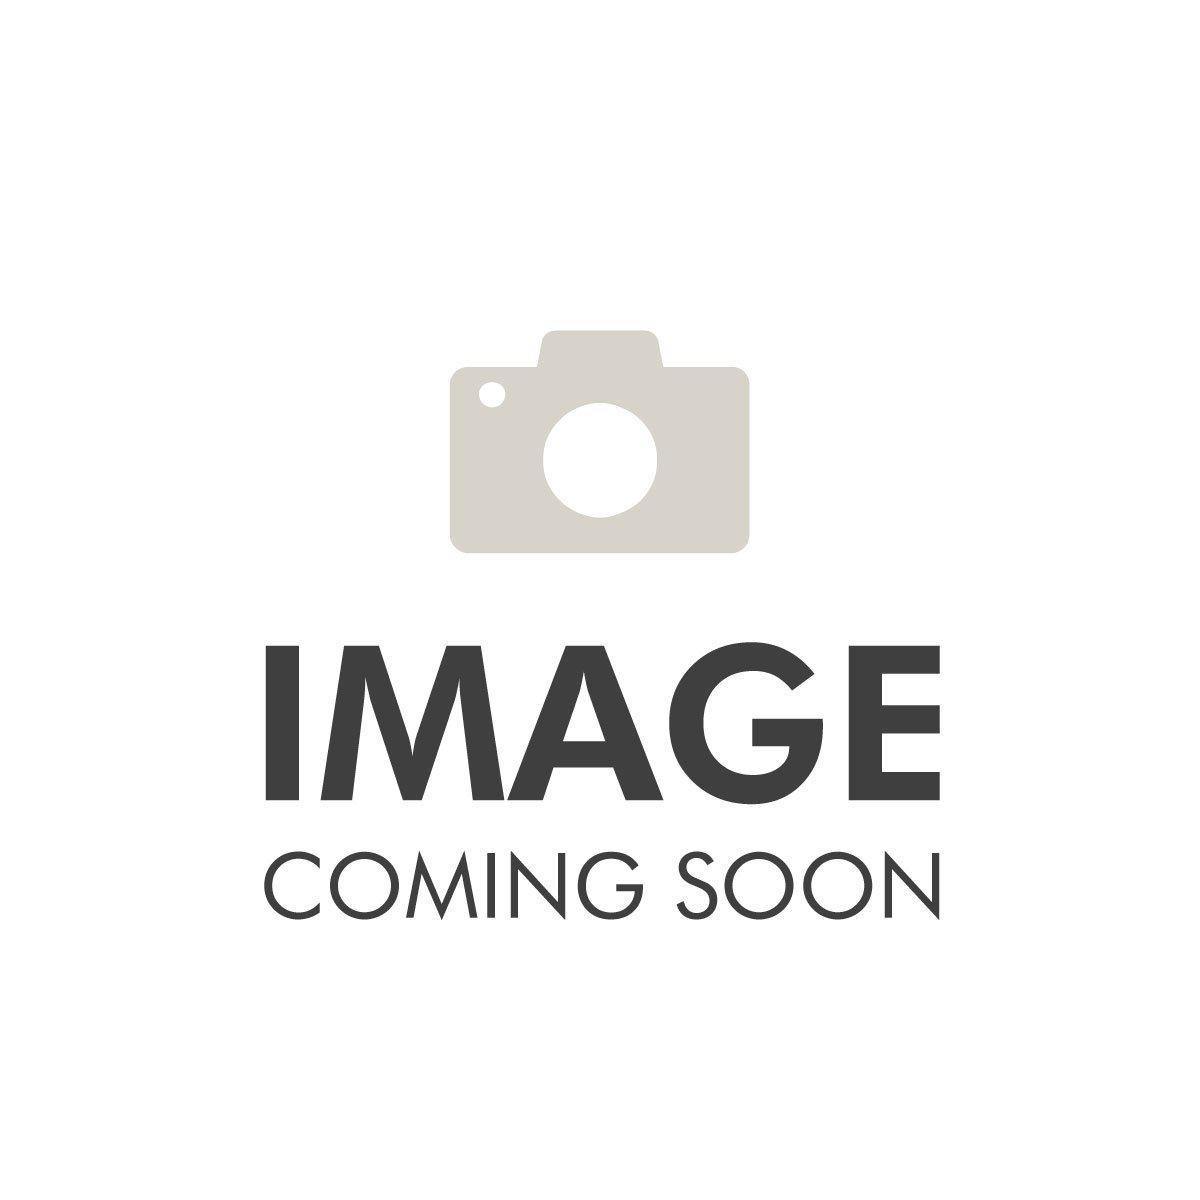 Absolute - Bavette retrofit - Inox